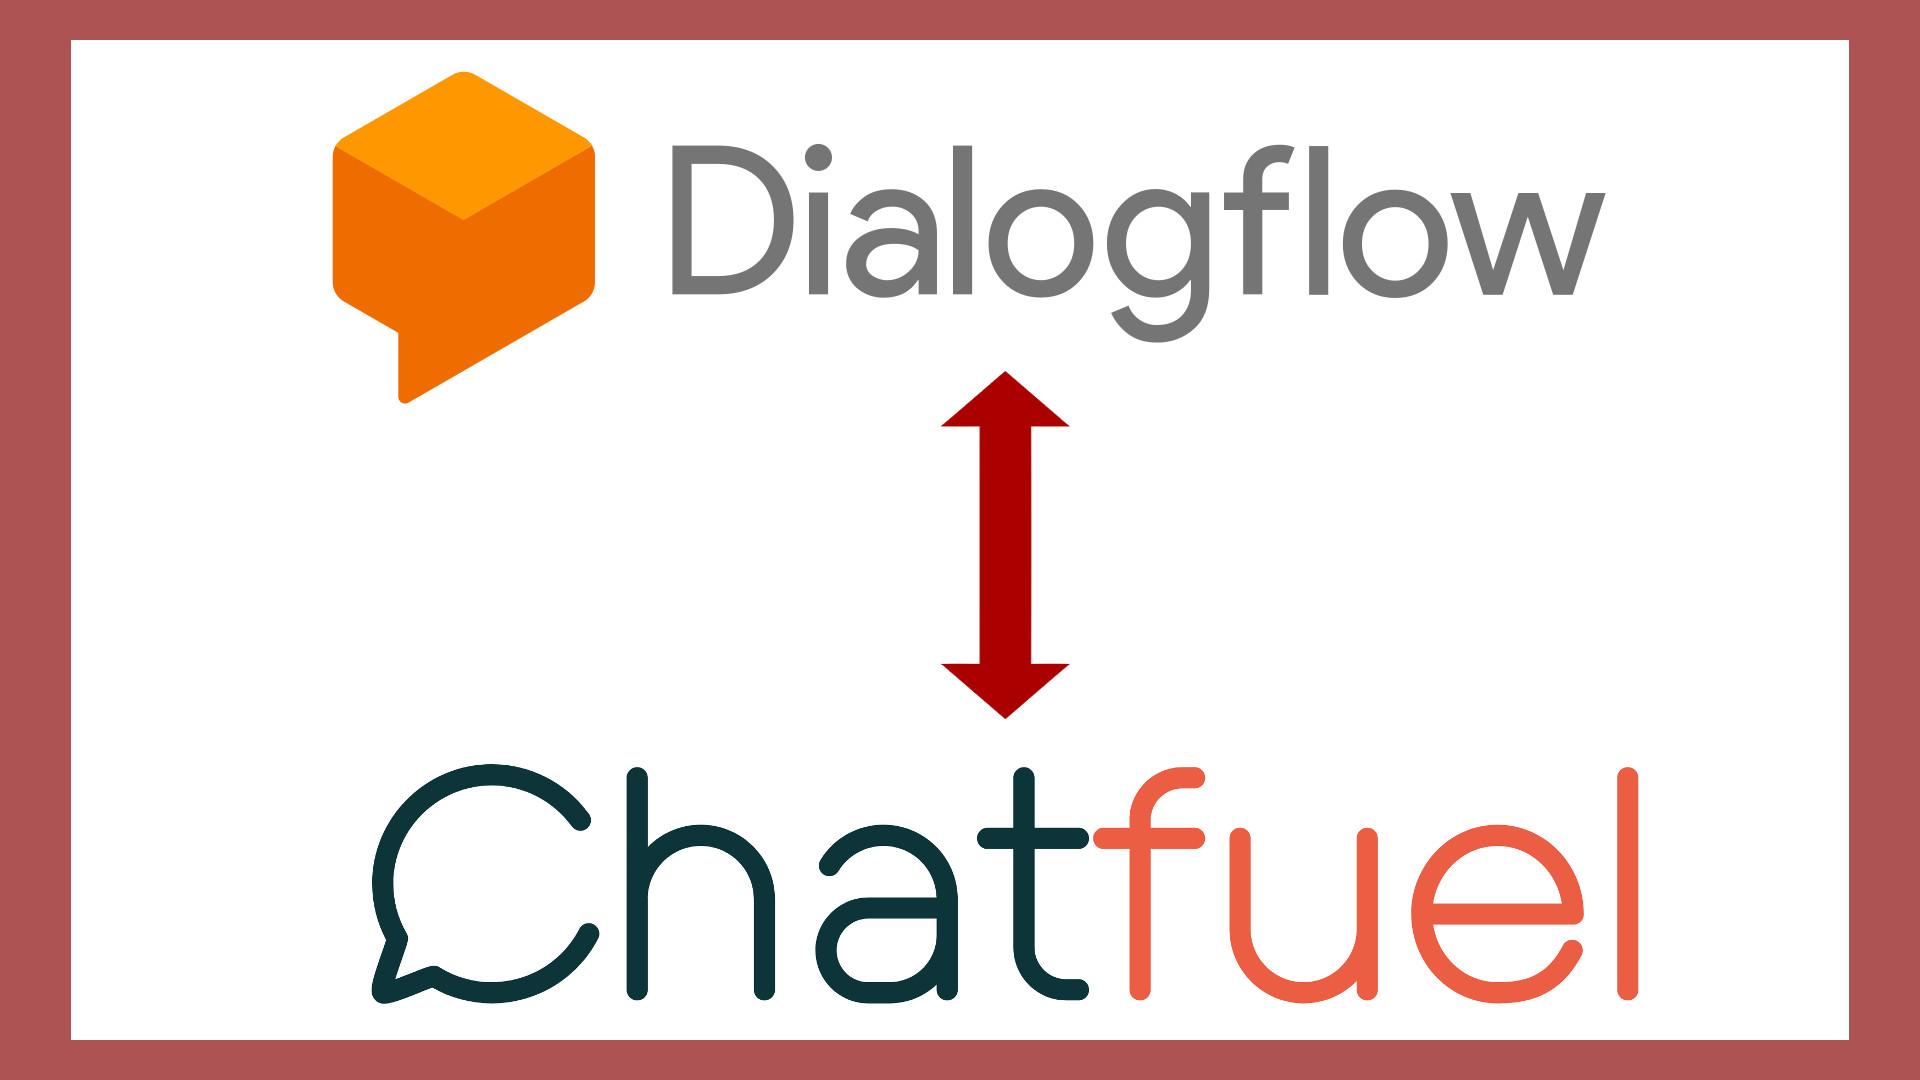 Chatfuel Dialogflow Integrator in Python for Facebook Messenger Bot